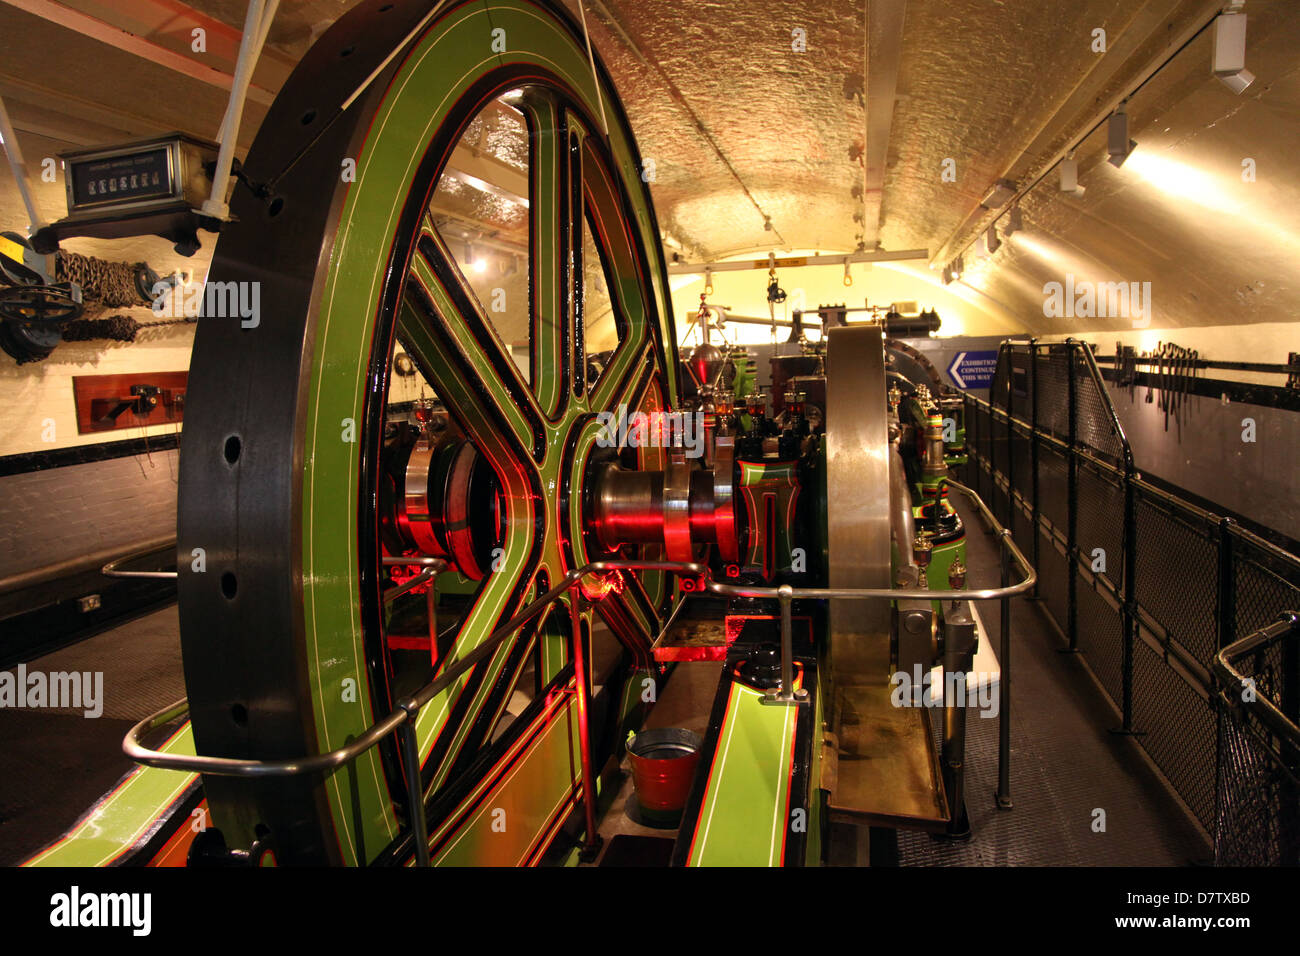 Engines for lifting gear, Tower Bridge, London, England, United Kingdom - Stock Image